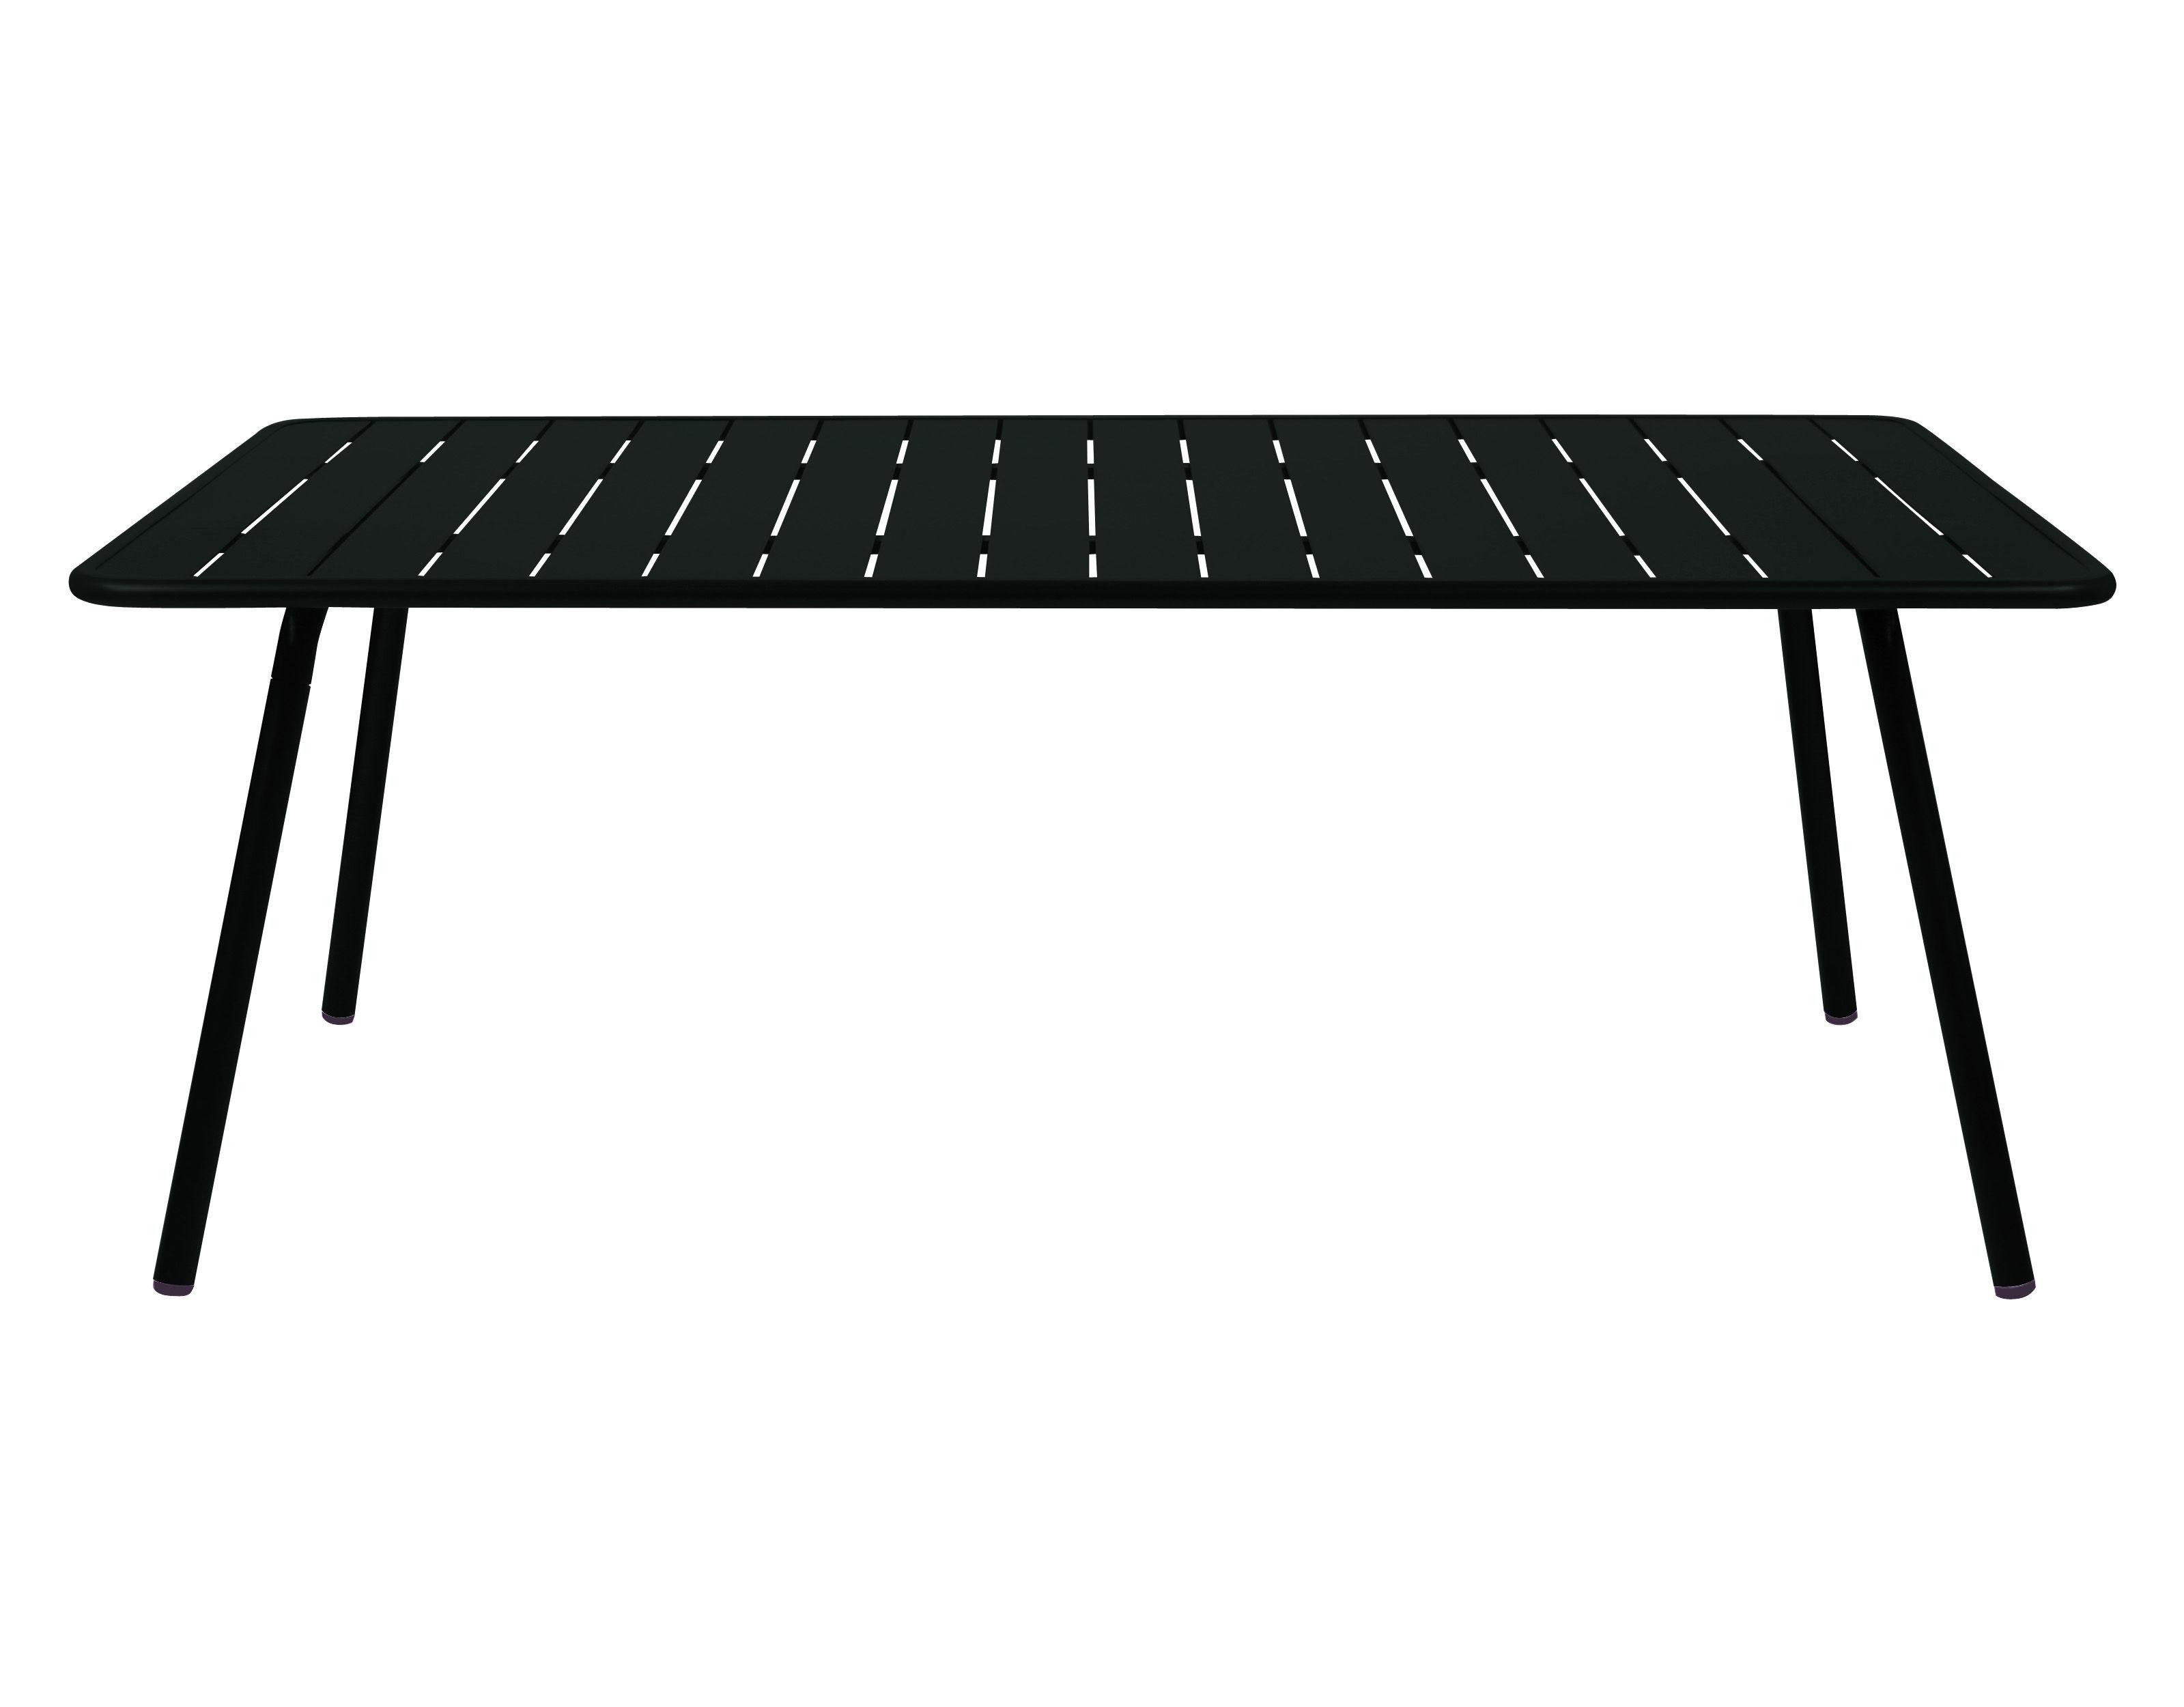 table luxembourg 8 personnes 207 x 100 cm aluminium r glisse fermob. Black Bedroom Furniture Sets. Home Design Ideas